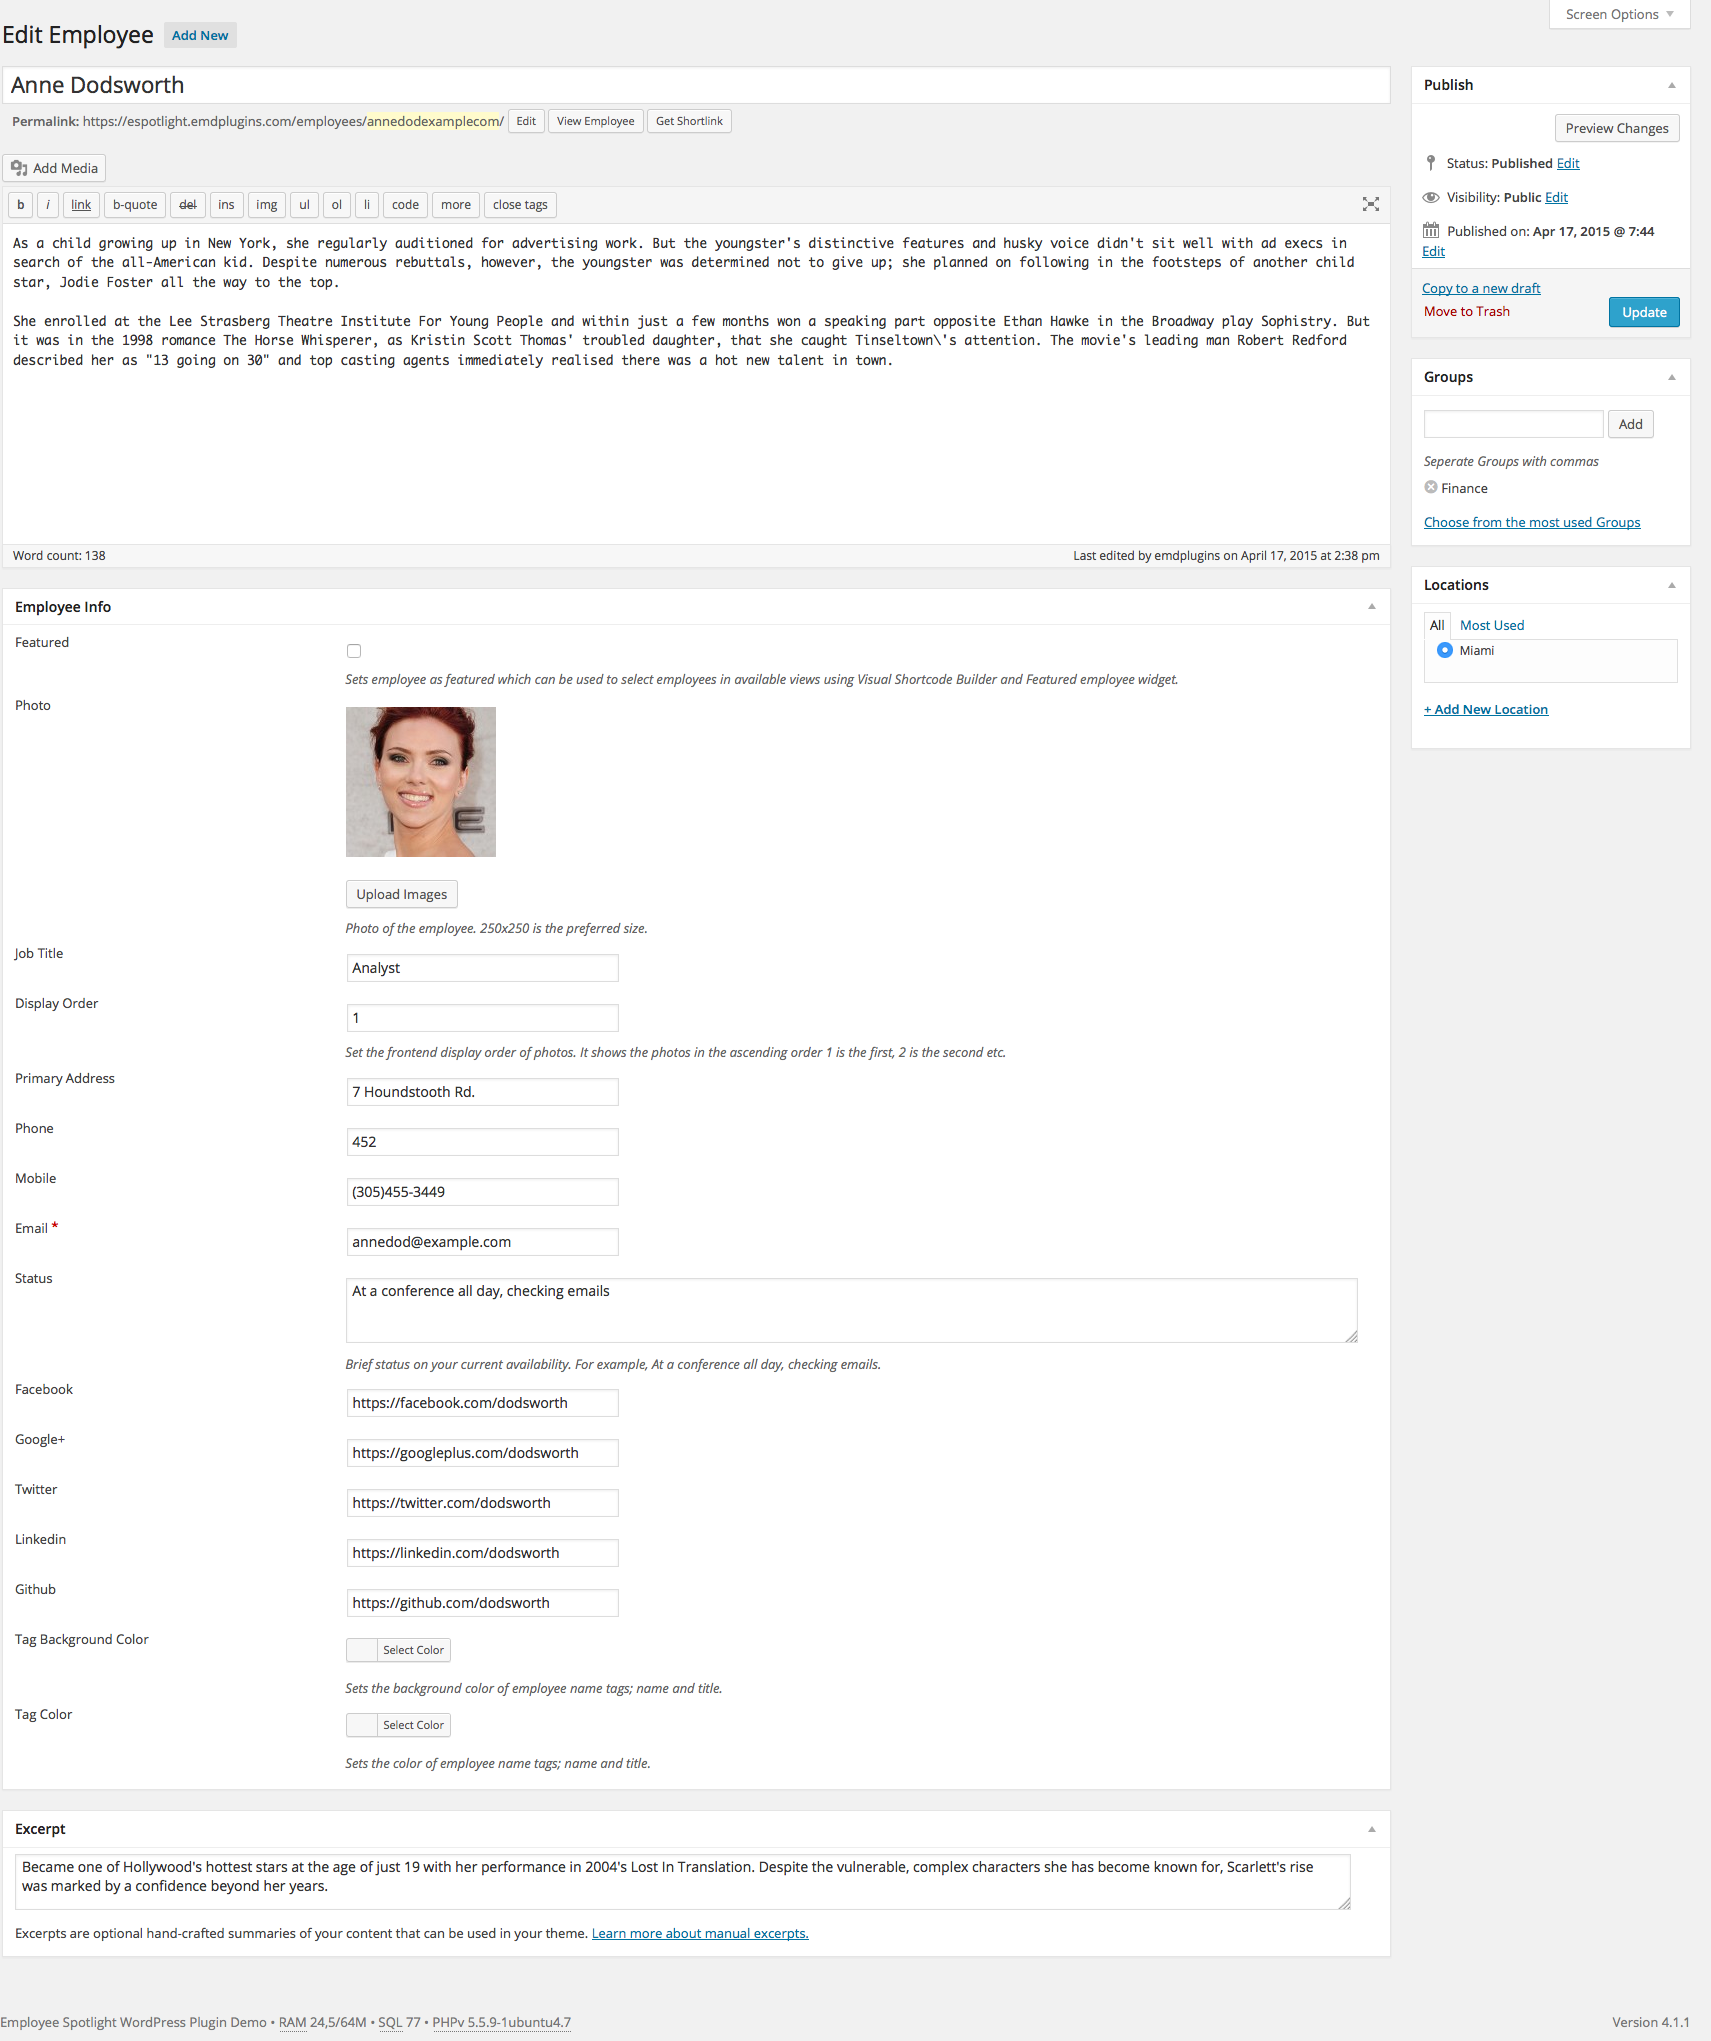 Employee Spotlight Pro Wordpress Plugin Employee Profile Single